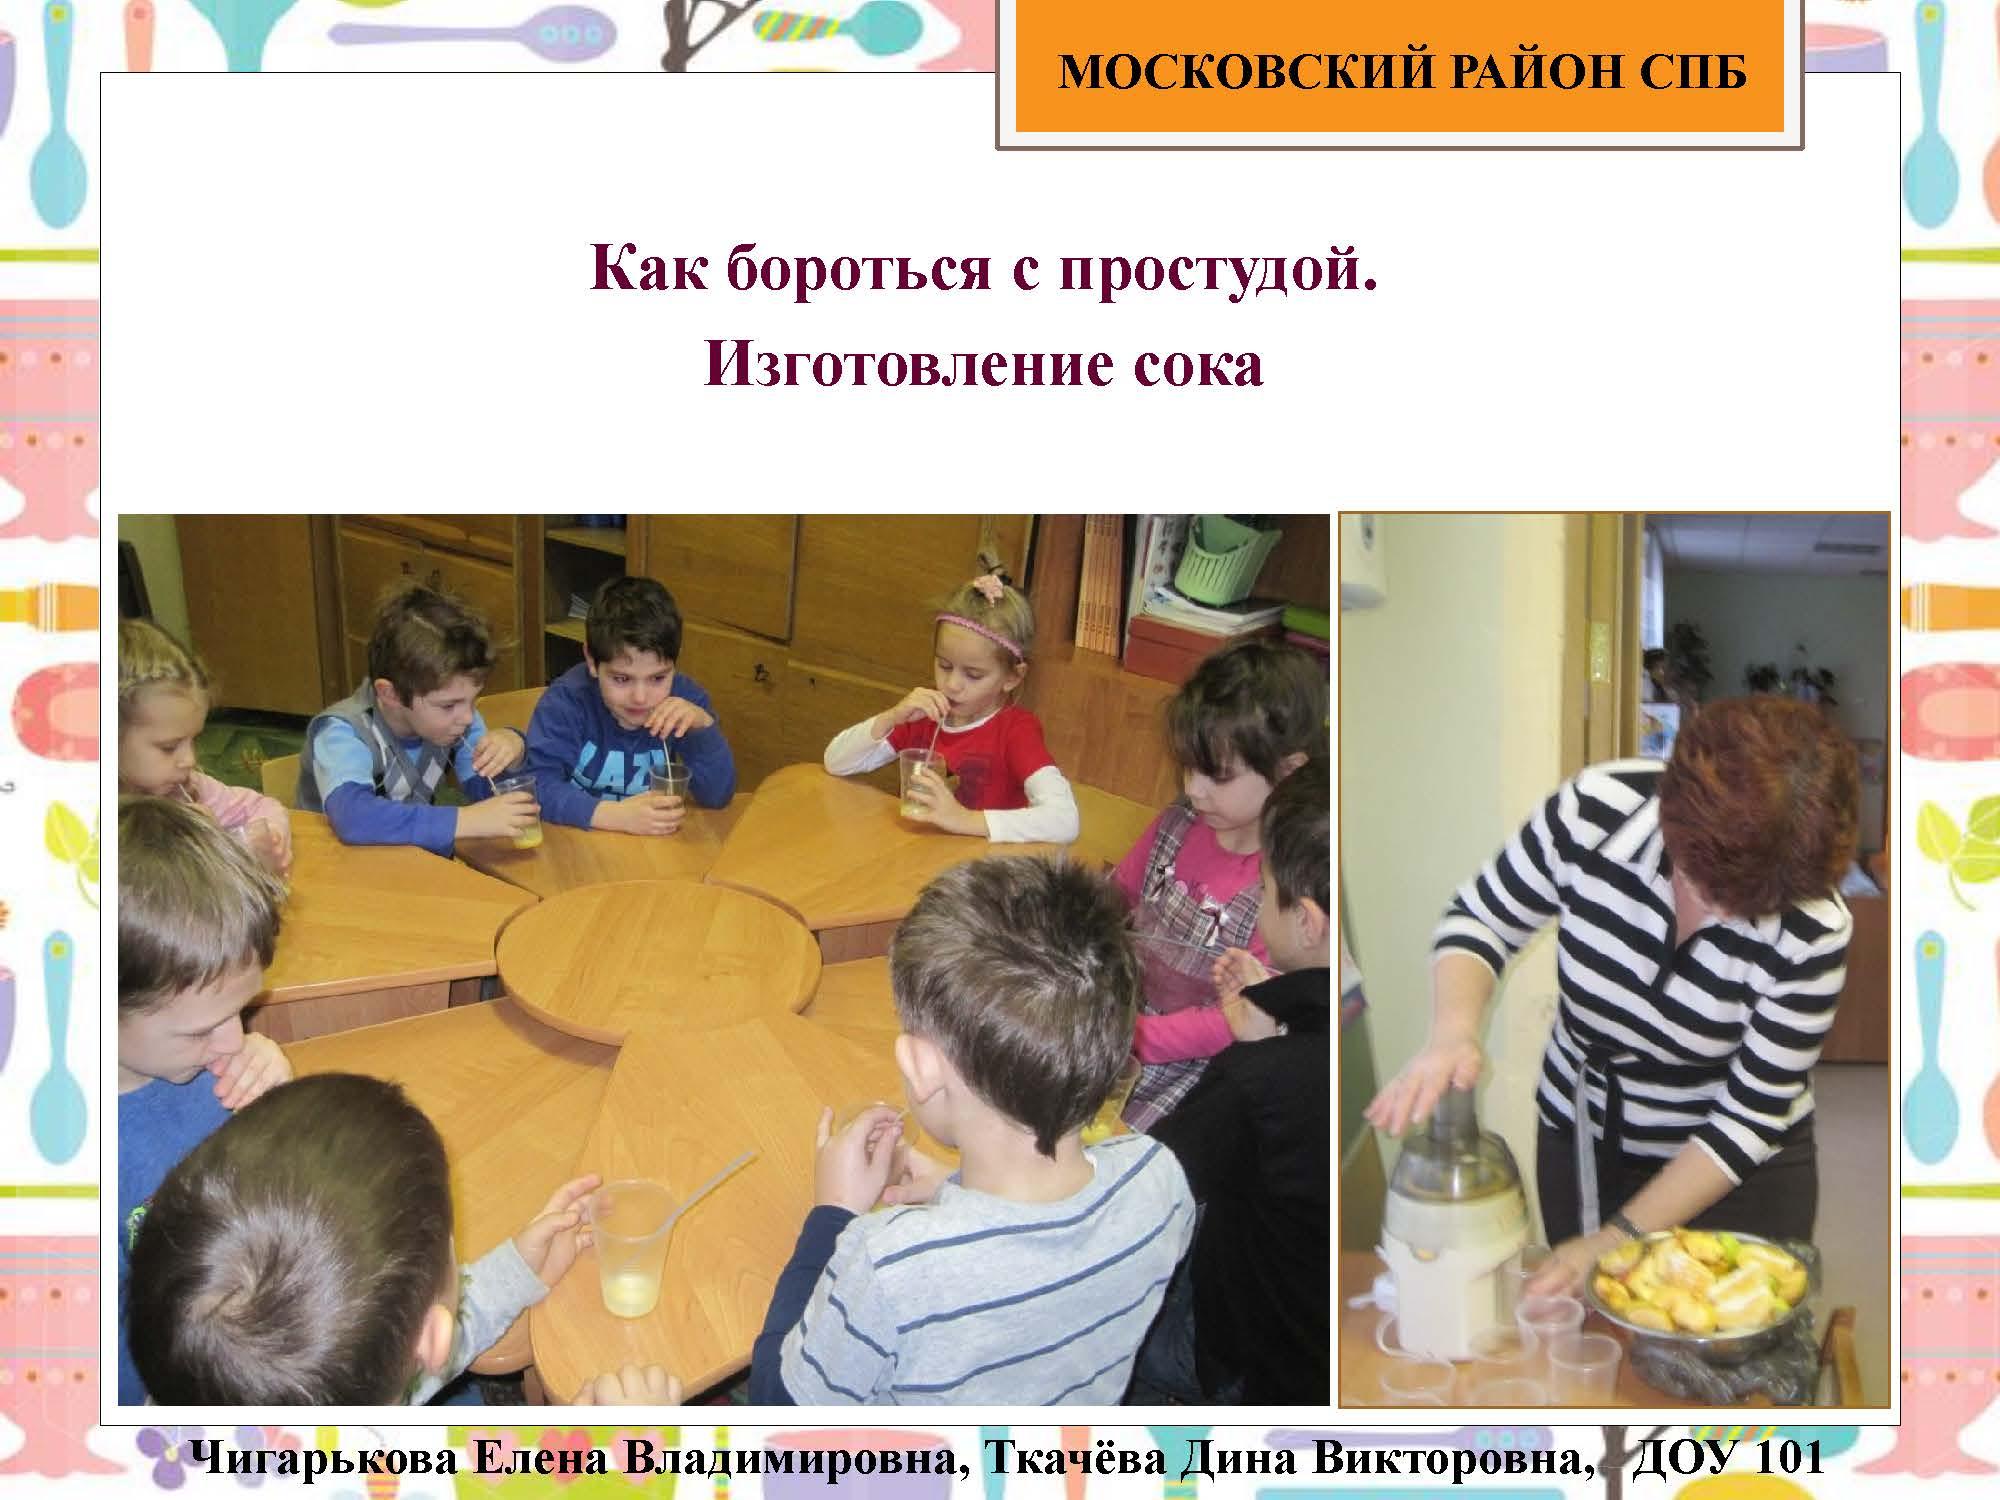 Секция 8. ДОУ 101, ПСИ. Московский район_Страница_14